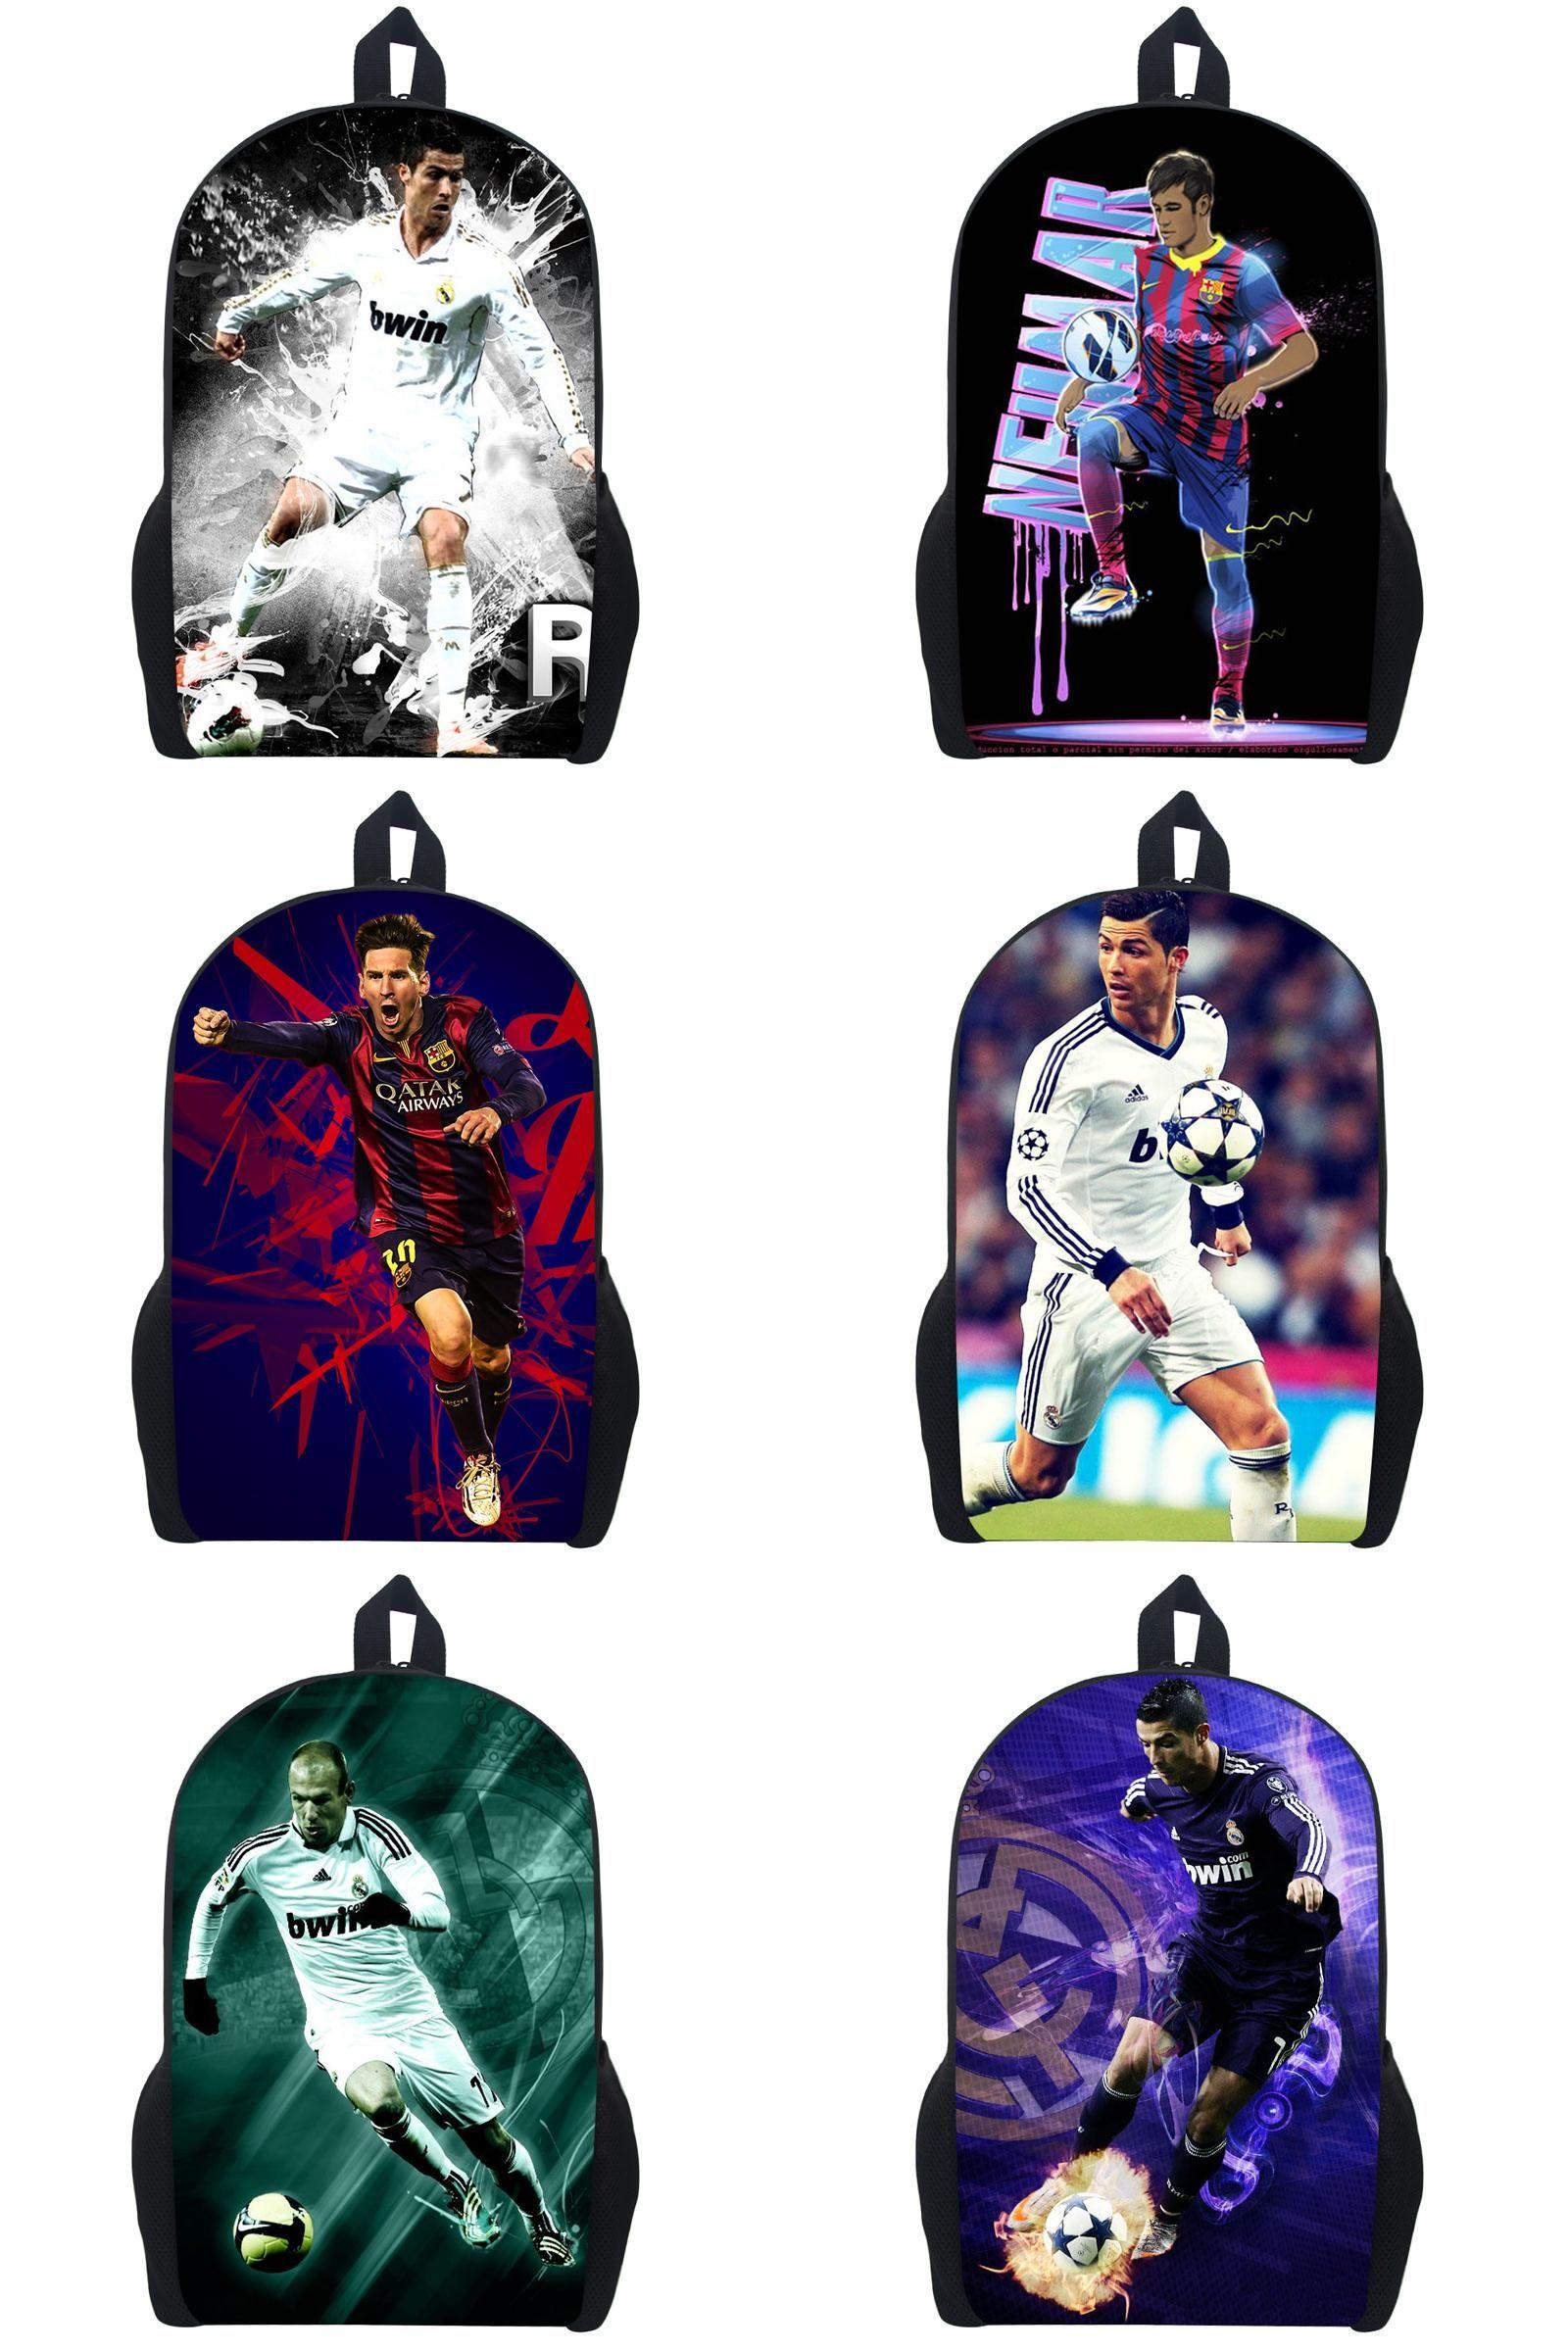 visit to cristiano ronaldo messi neymar backpack cool